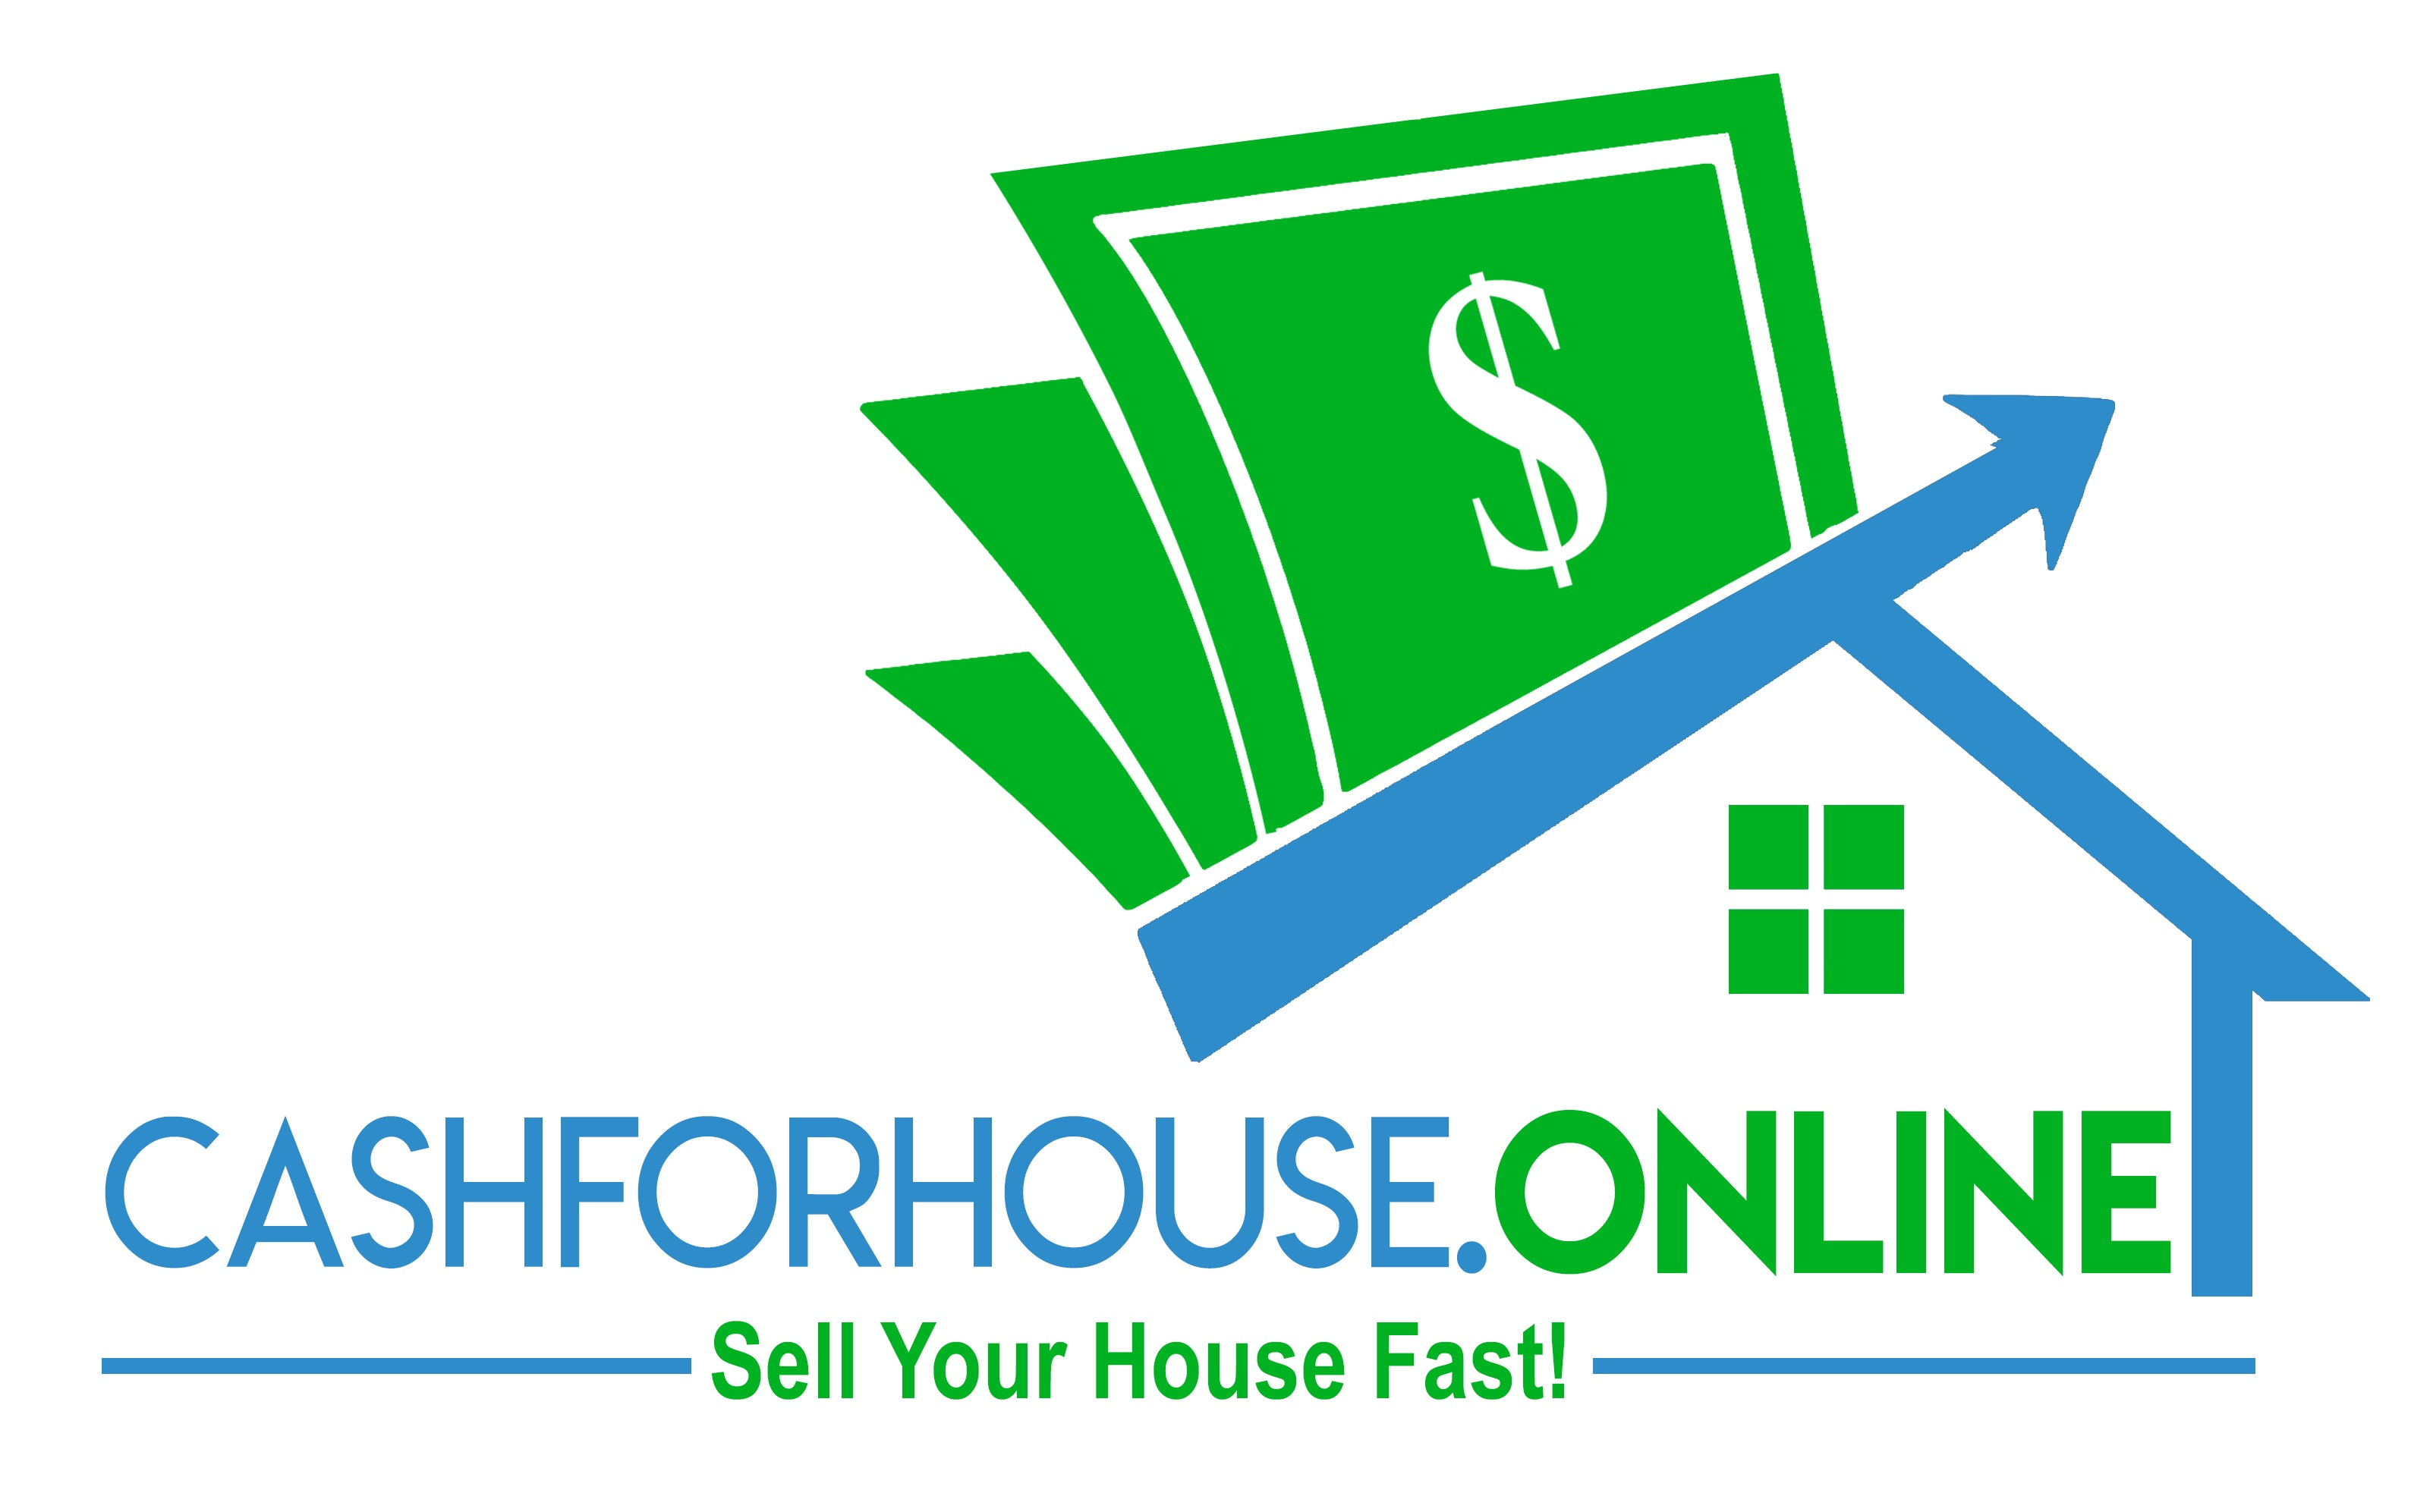 CashForHouse_2_Cropped.jpg